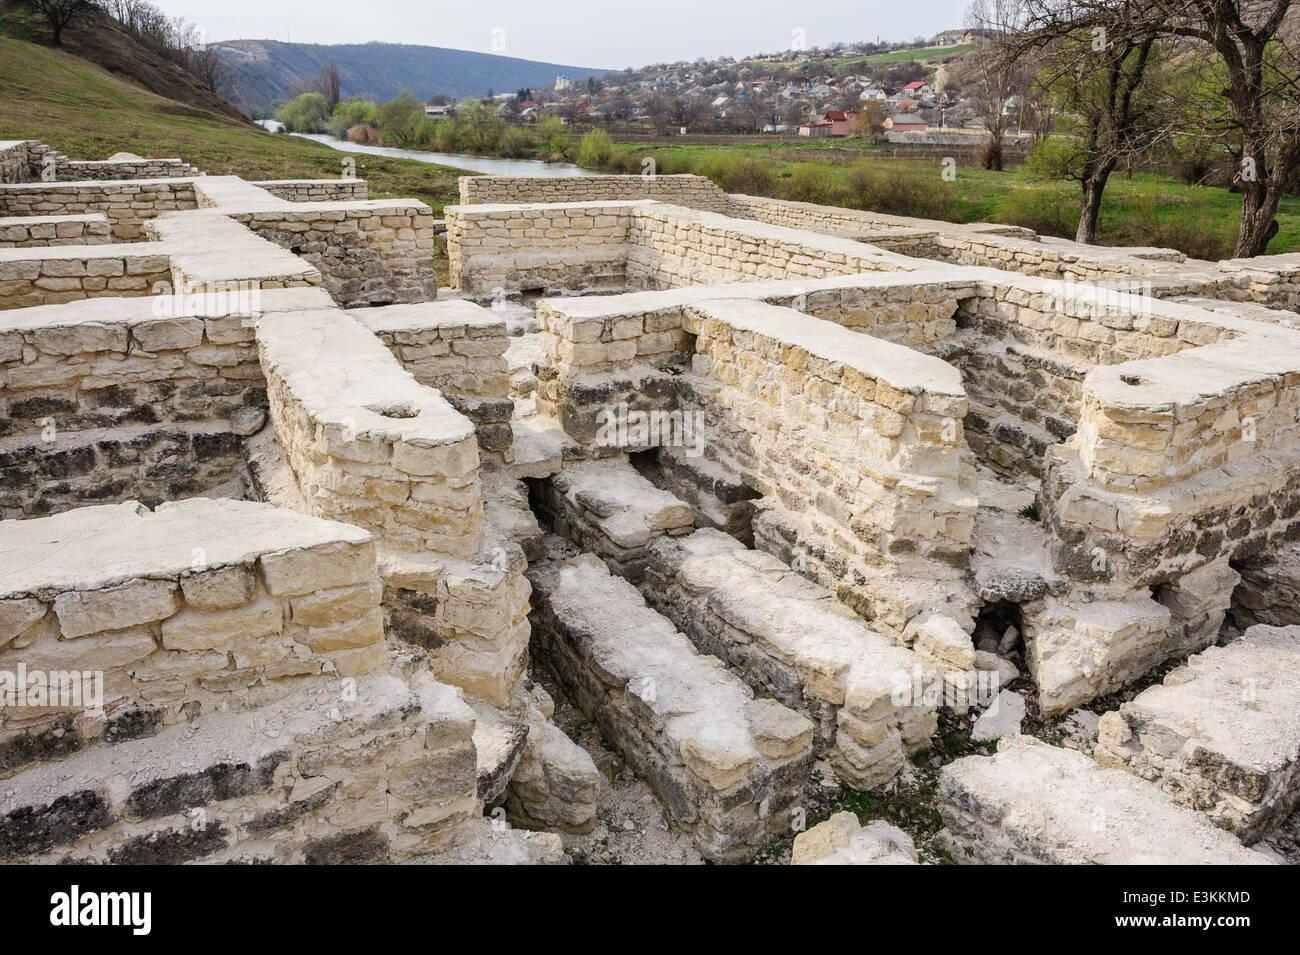 Ruins of public bath, old Orhei, Moldova - Stock Image